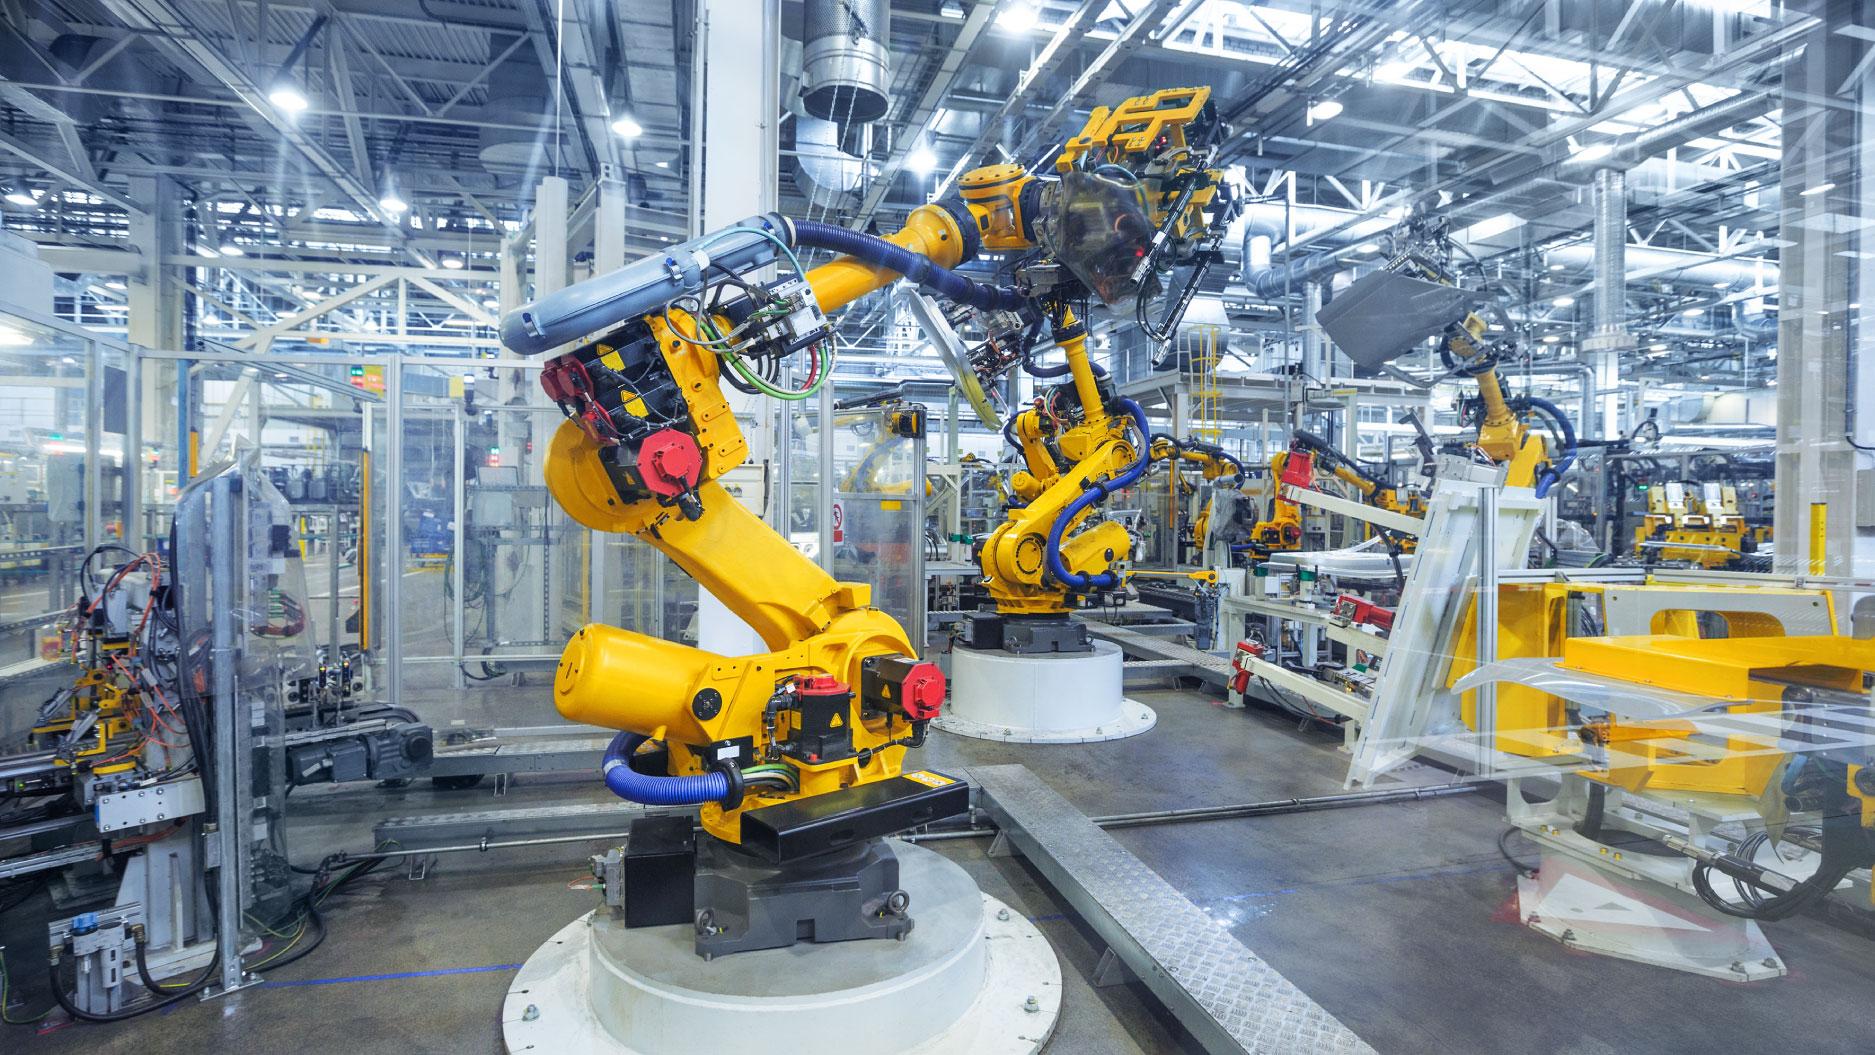 Yellow-Industrial-Equipment-warehouse